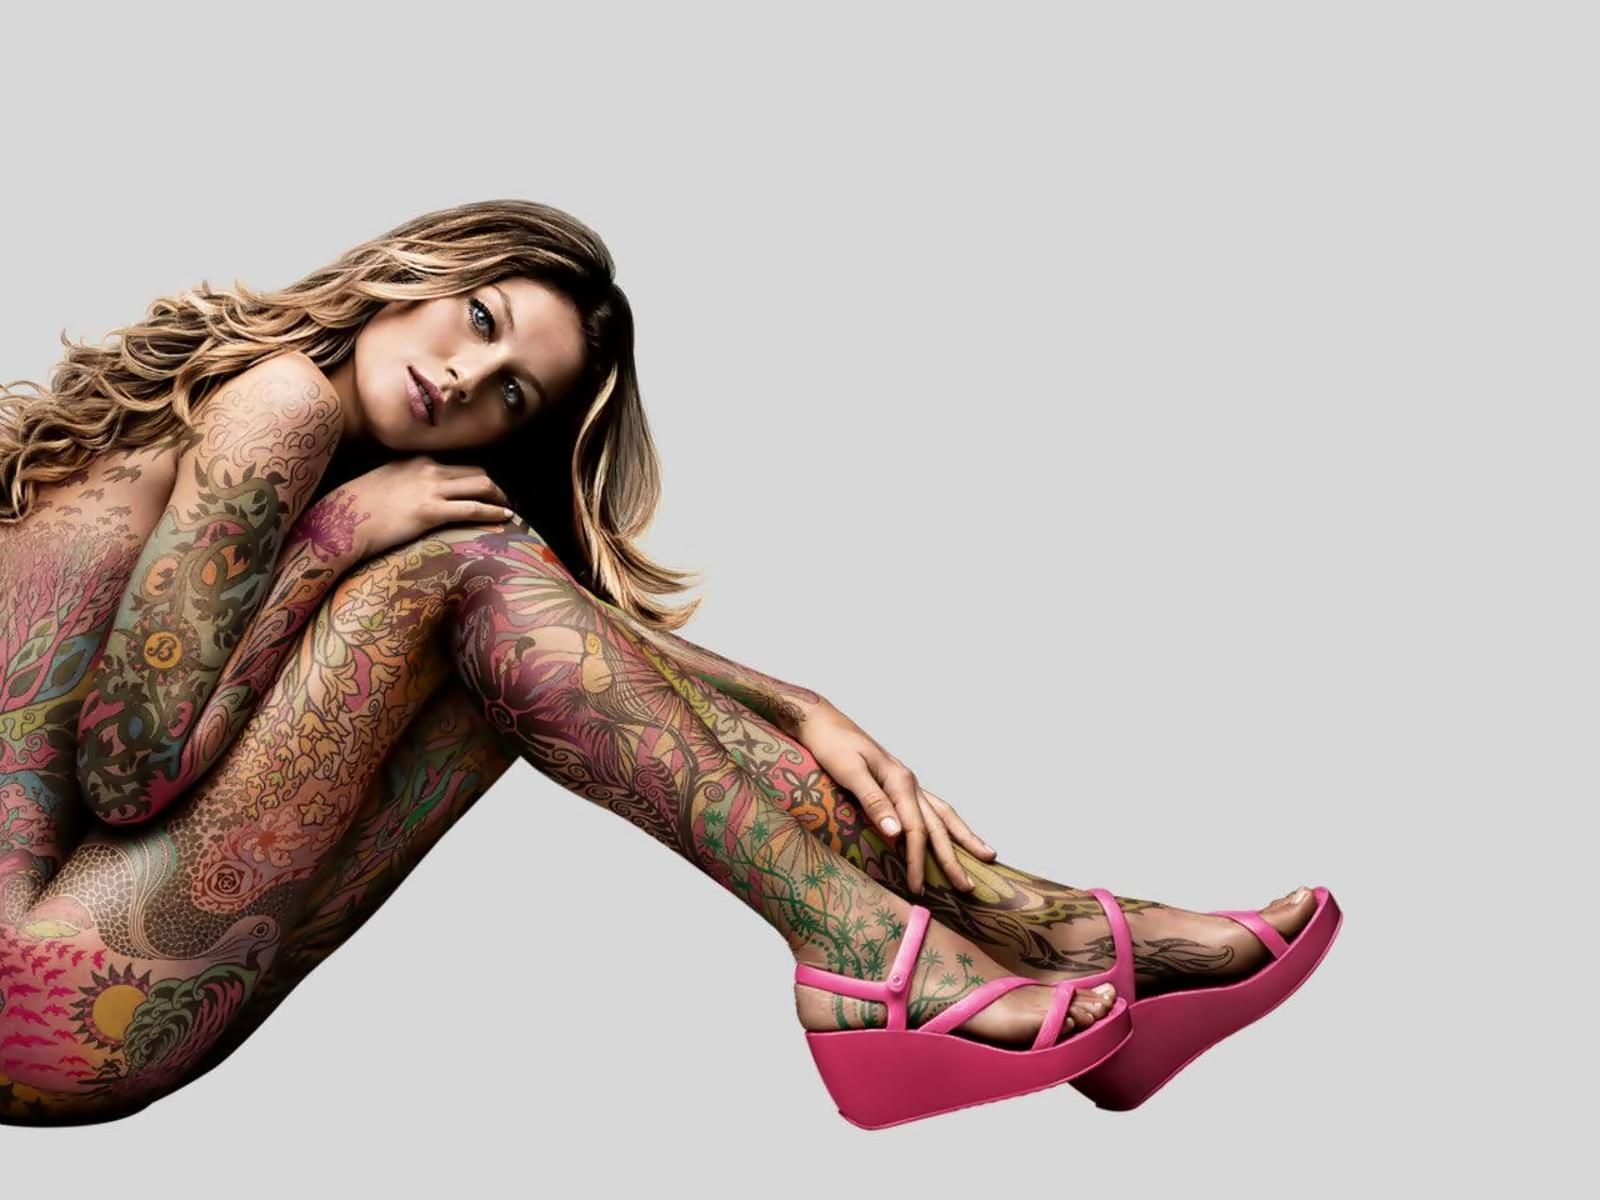 Girls Tattoos HD Wallpapers – wallpaper202